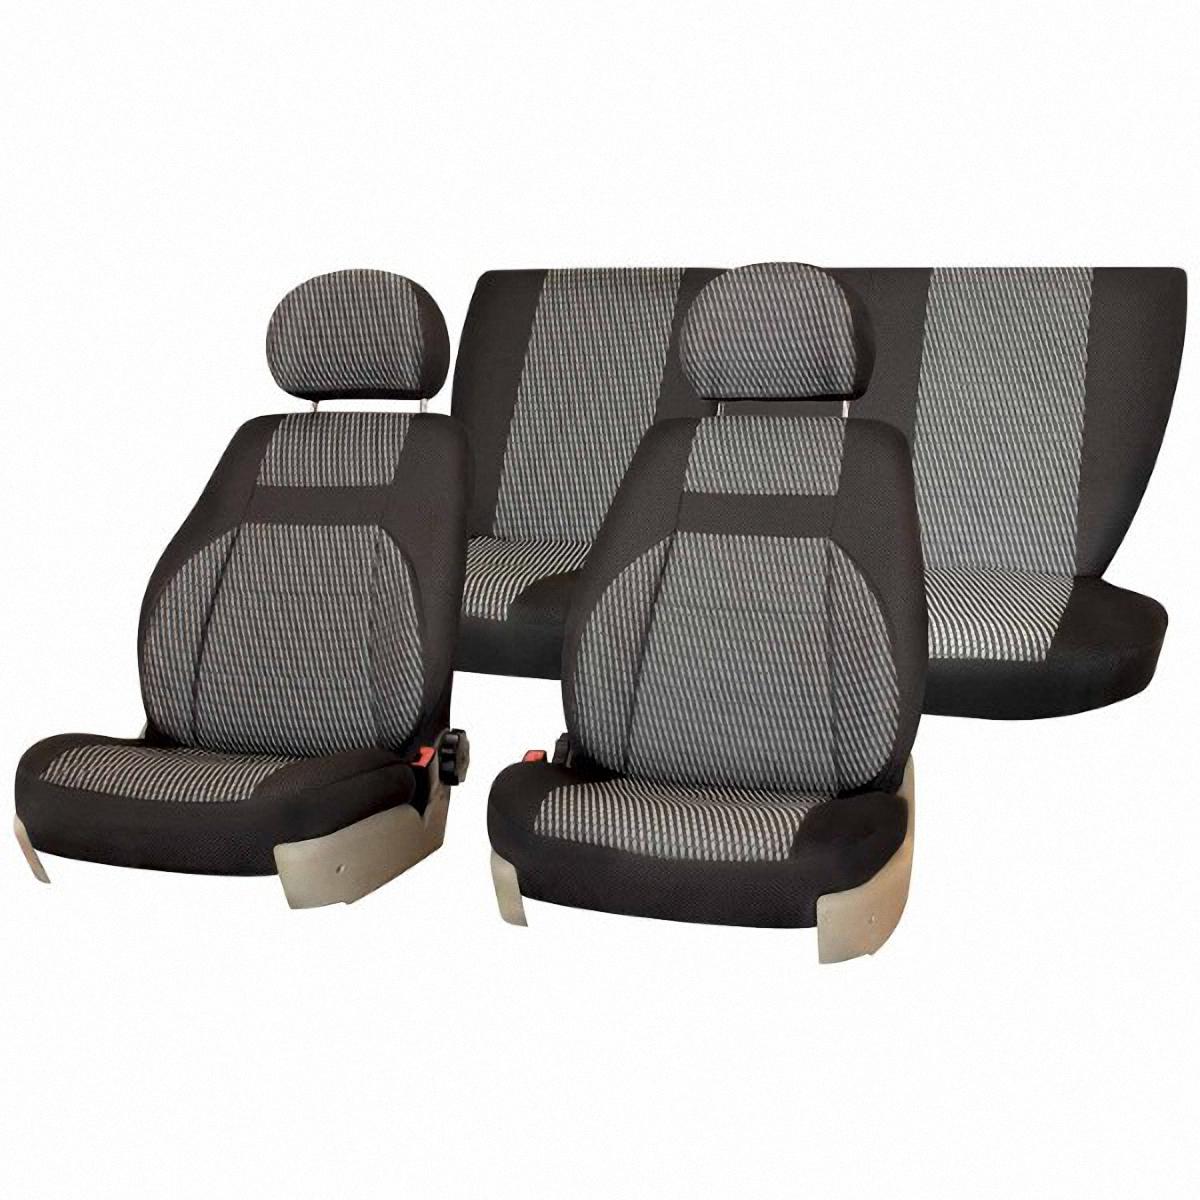 Чехол на сиденье Skyway ВАЗ-2107. V012-D1 колонка rexant 2107 18 2107 black